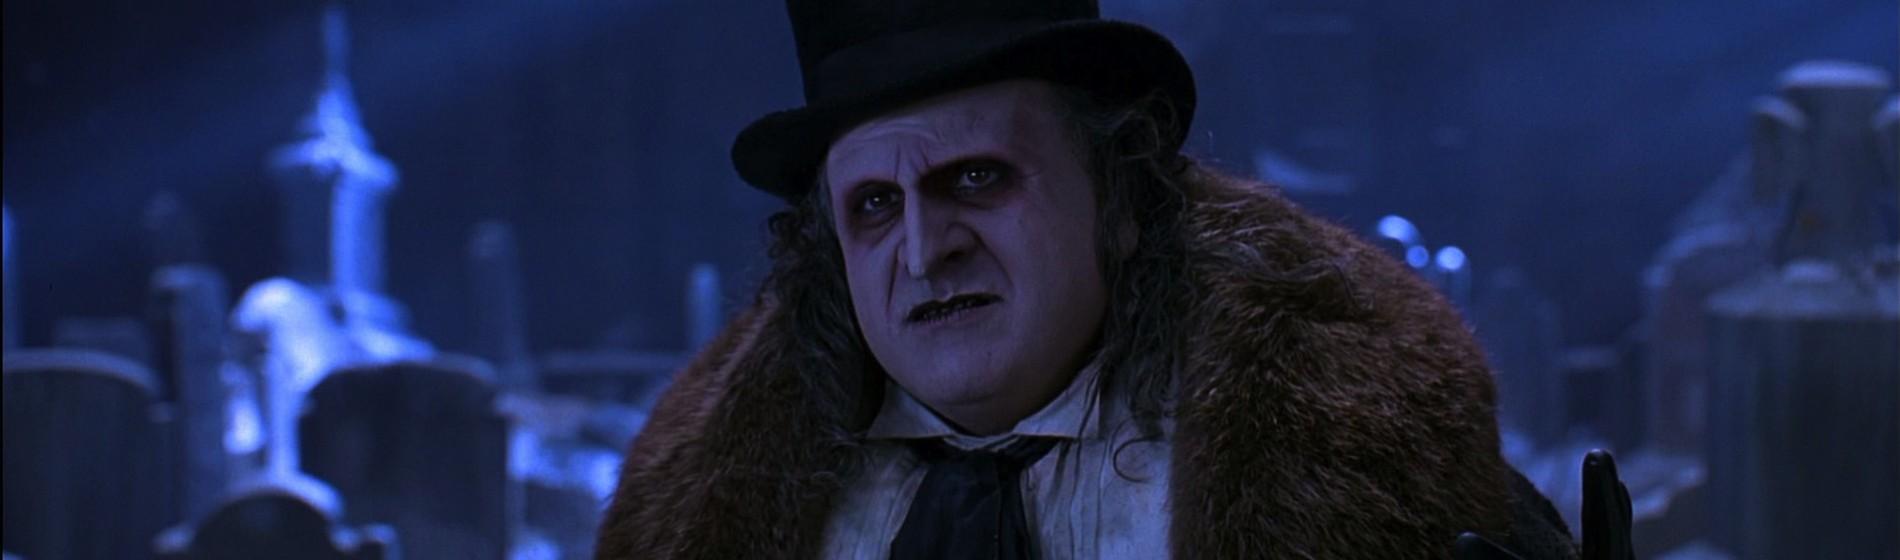 batman-returns-movie-penguin